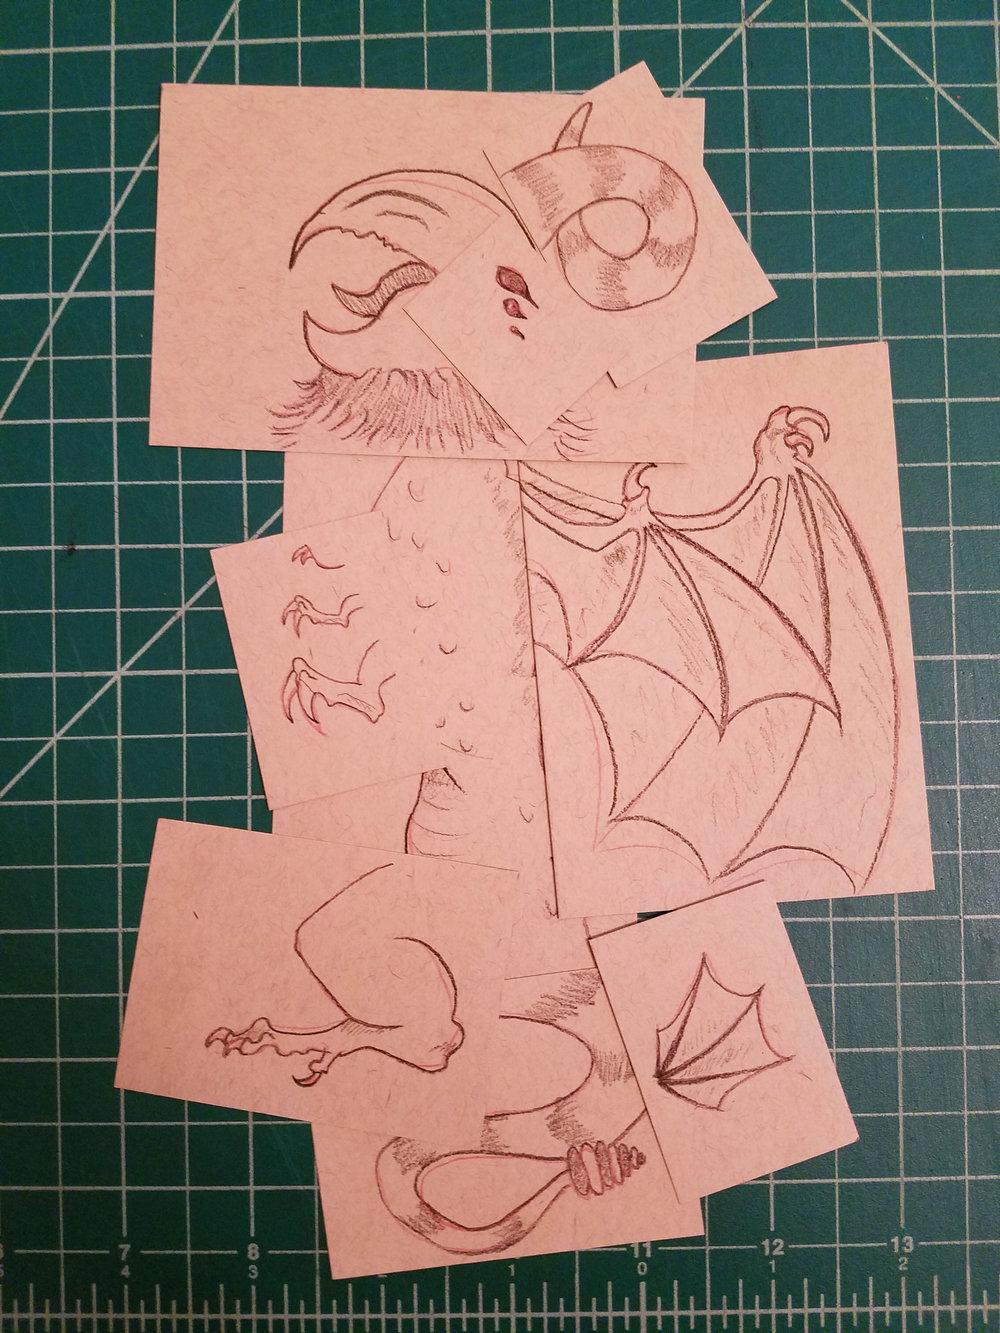 Draftcards2.jpg